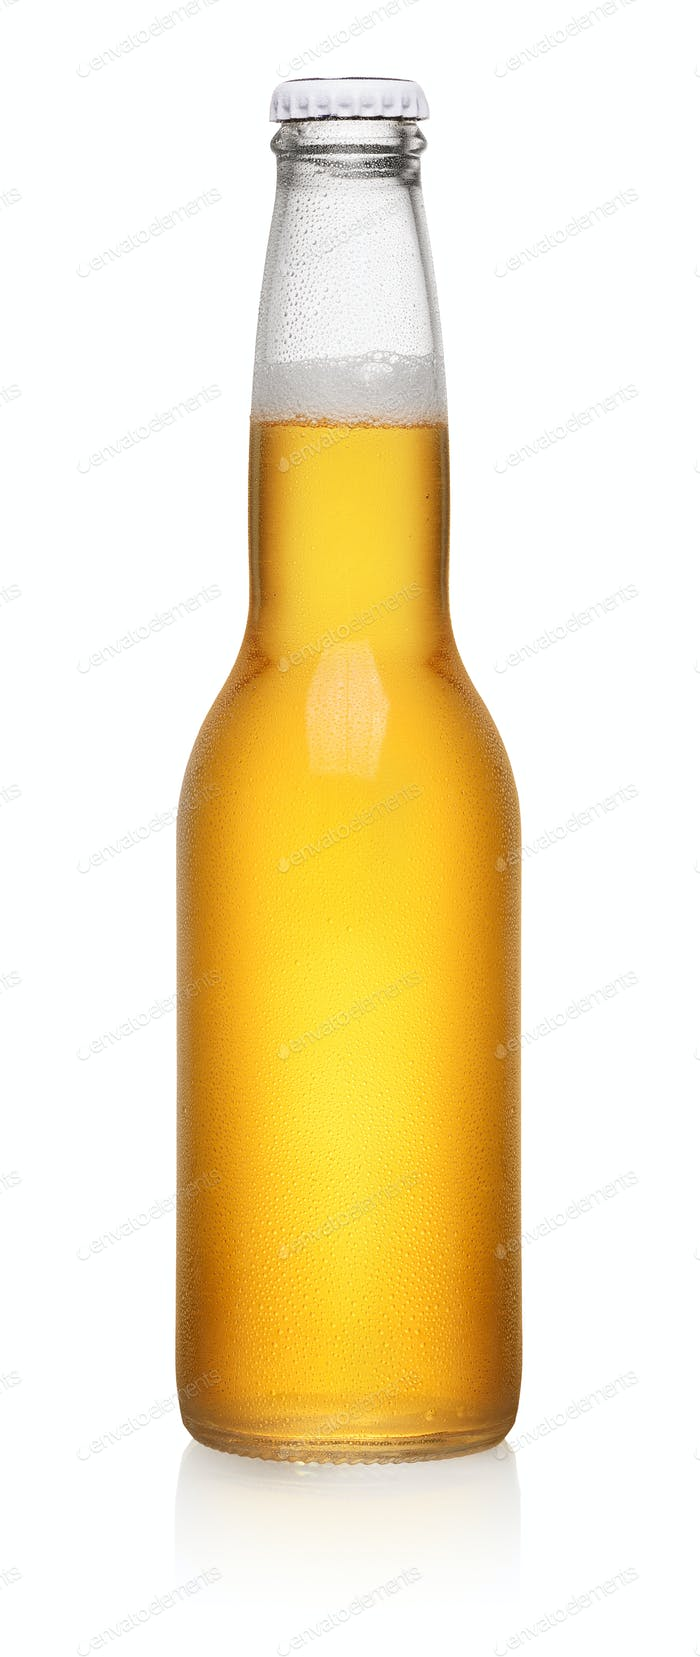 Yellow bottle of beer